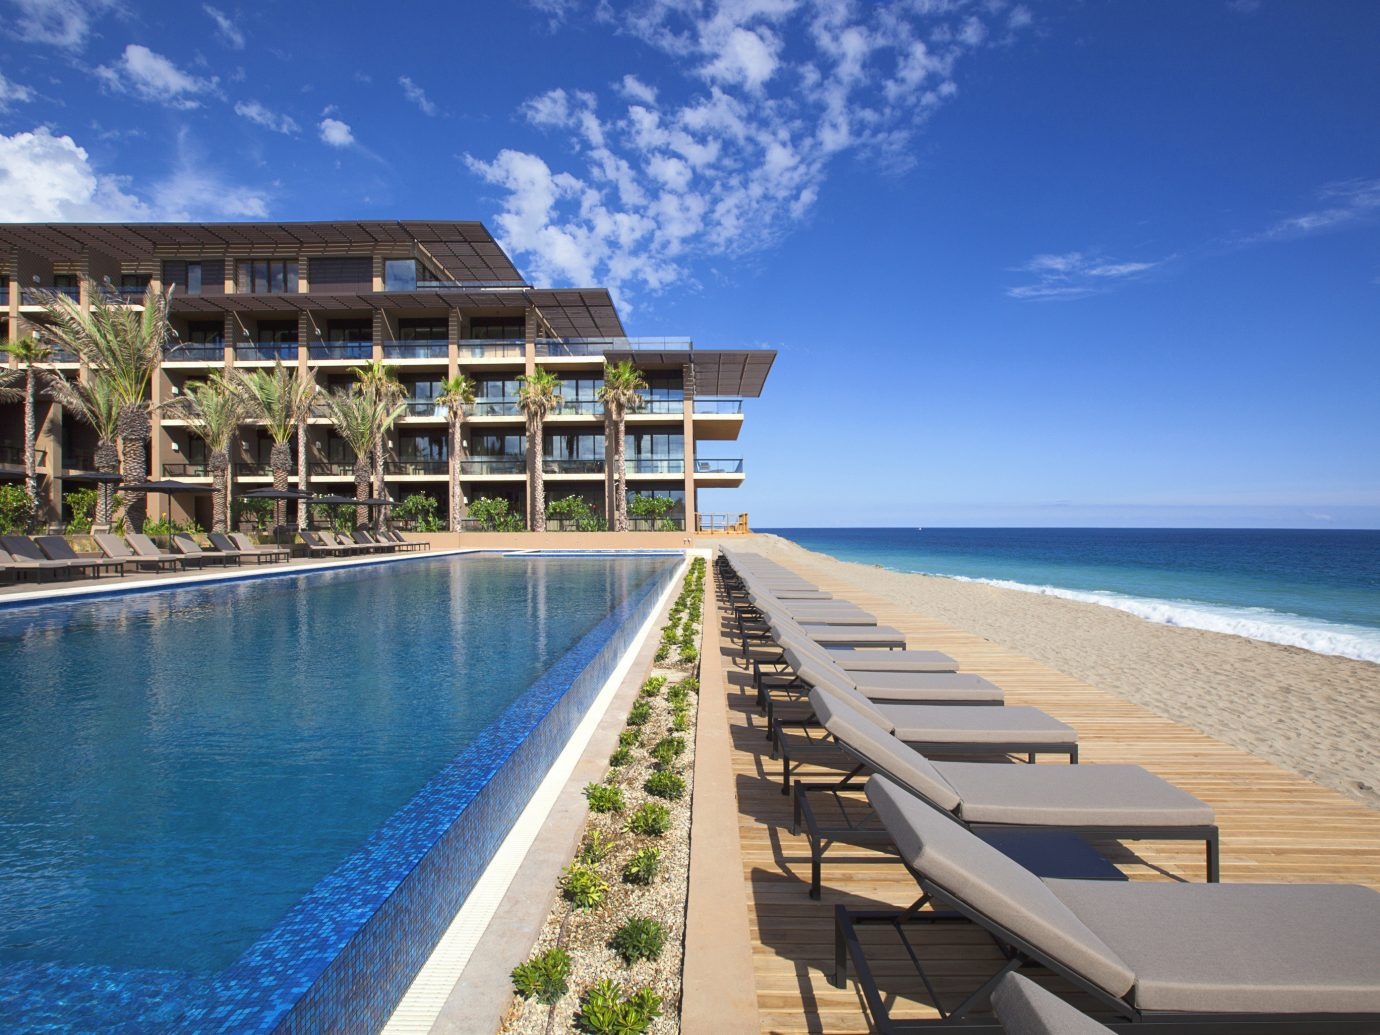 Pool and ocean view at JW Marriott Los Cabos